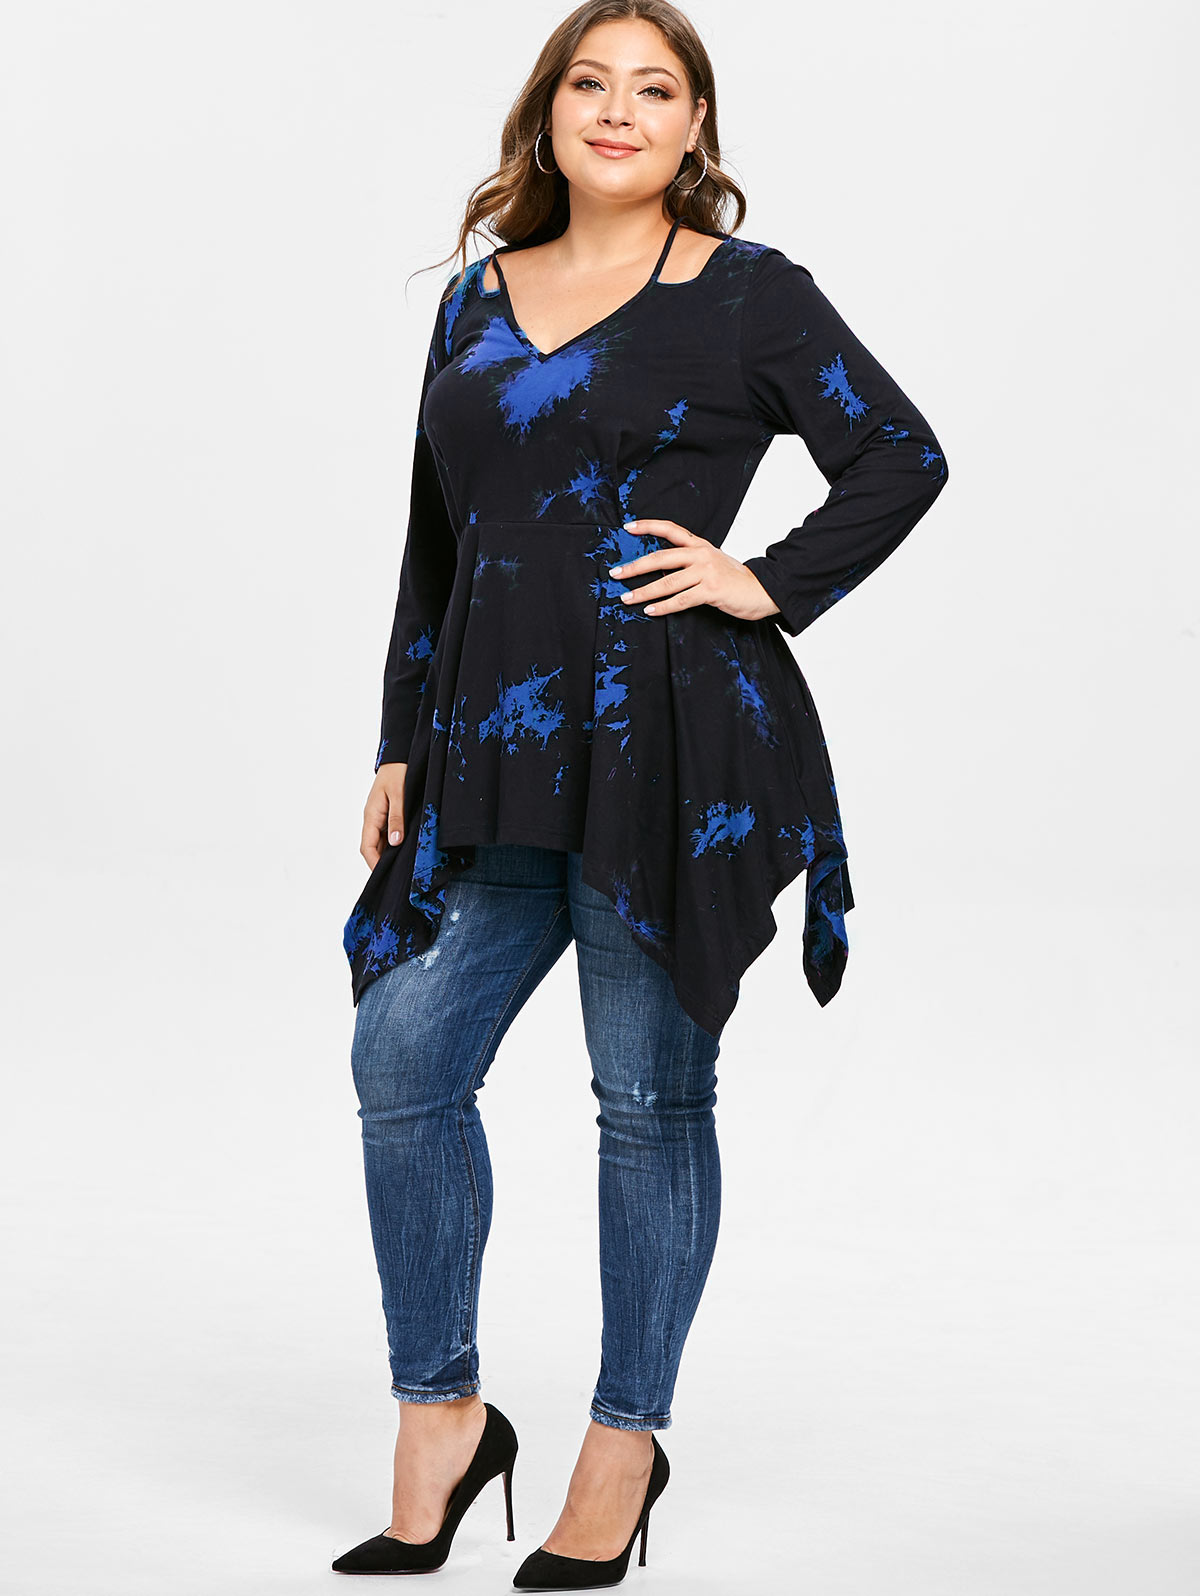 Shirt Length Long Sleeve Length Full Collar V-Neck Style Fashion  Season Spring a4fdba6d056e